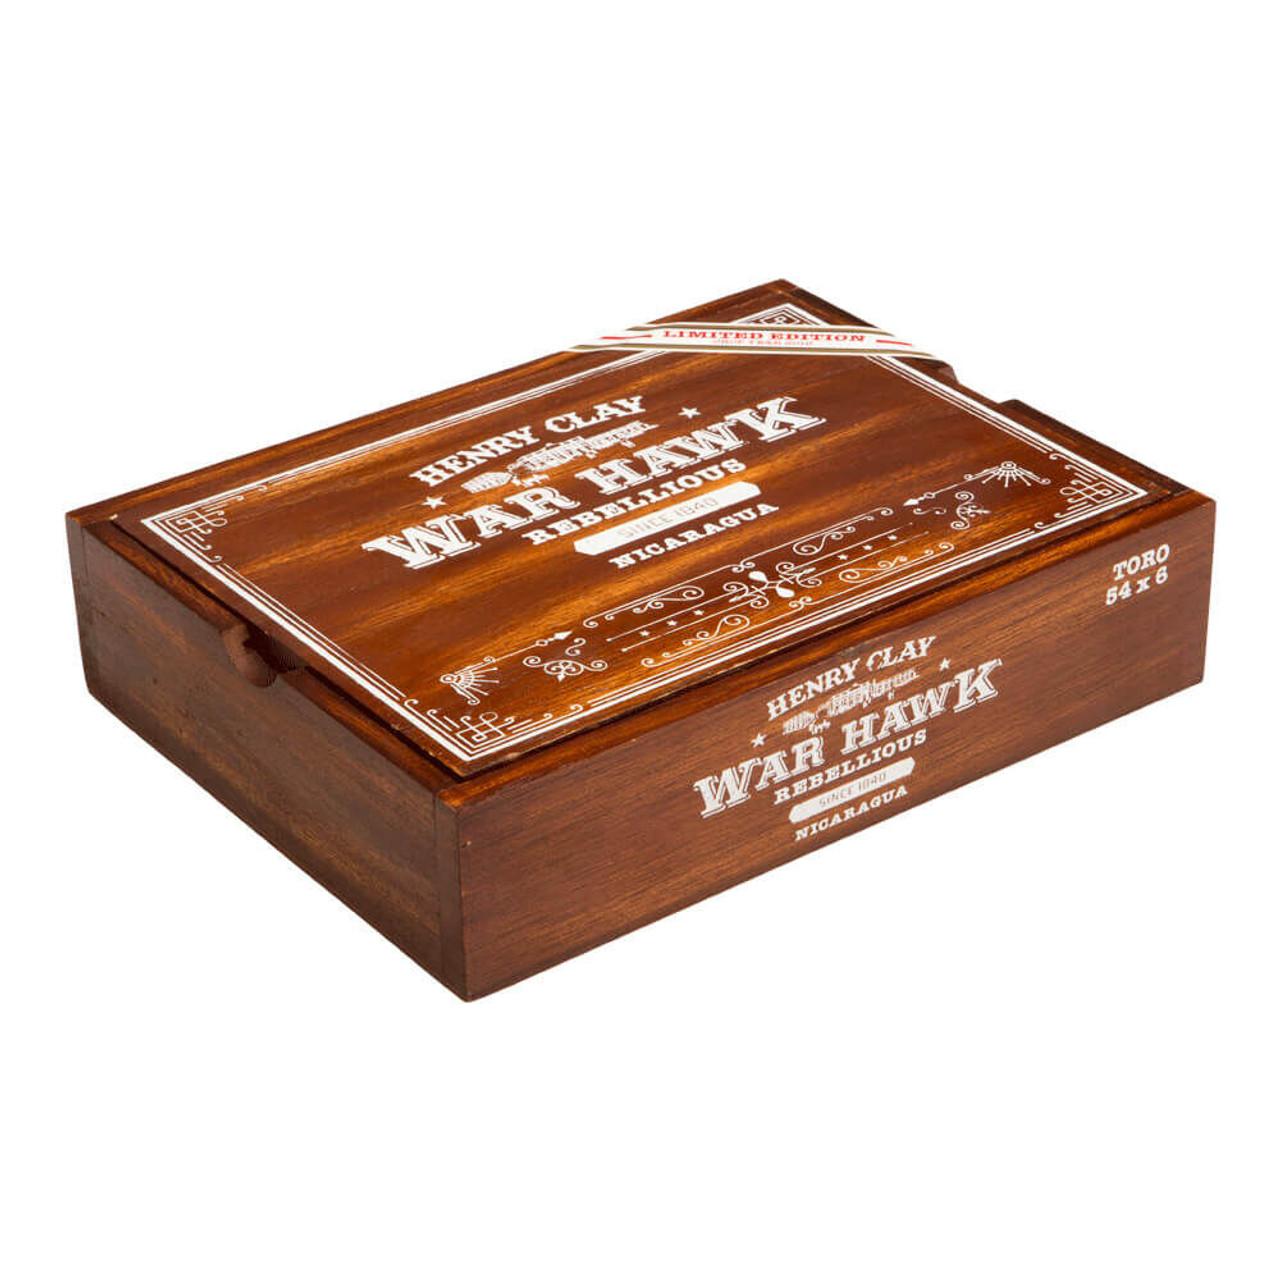 Henry Clay War Hawk Rebellious Toro Cigars - 6.0 x 54 (Box of 20)